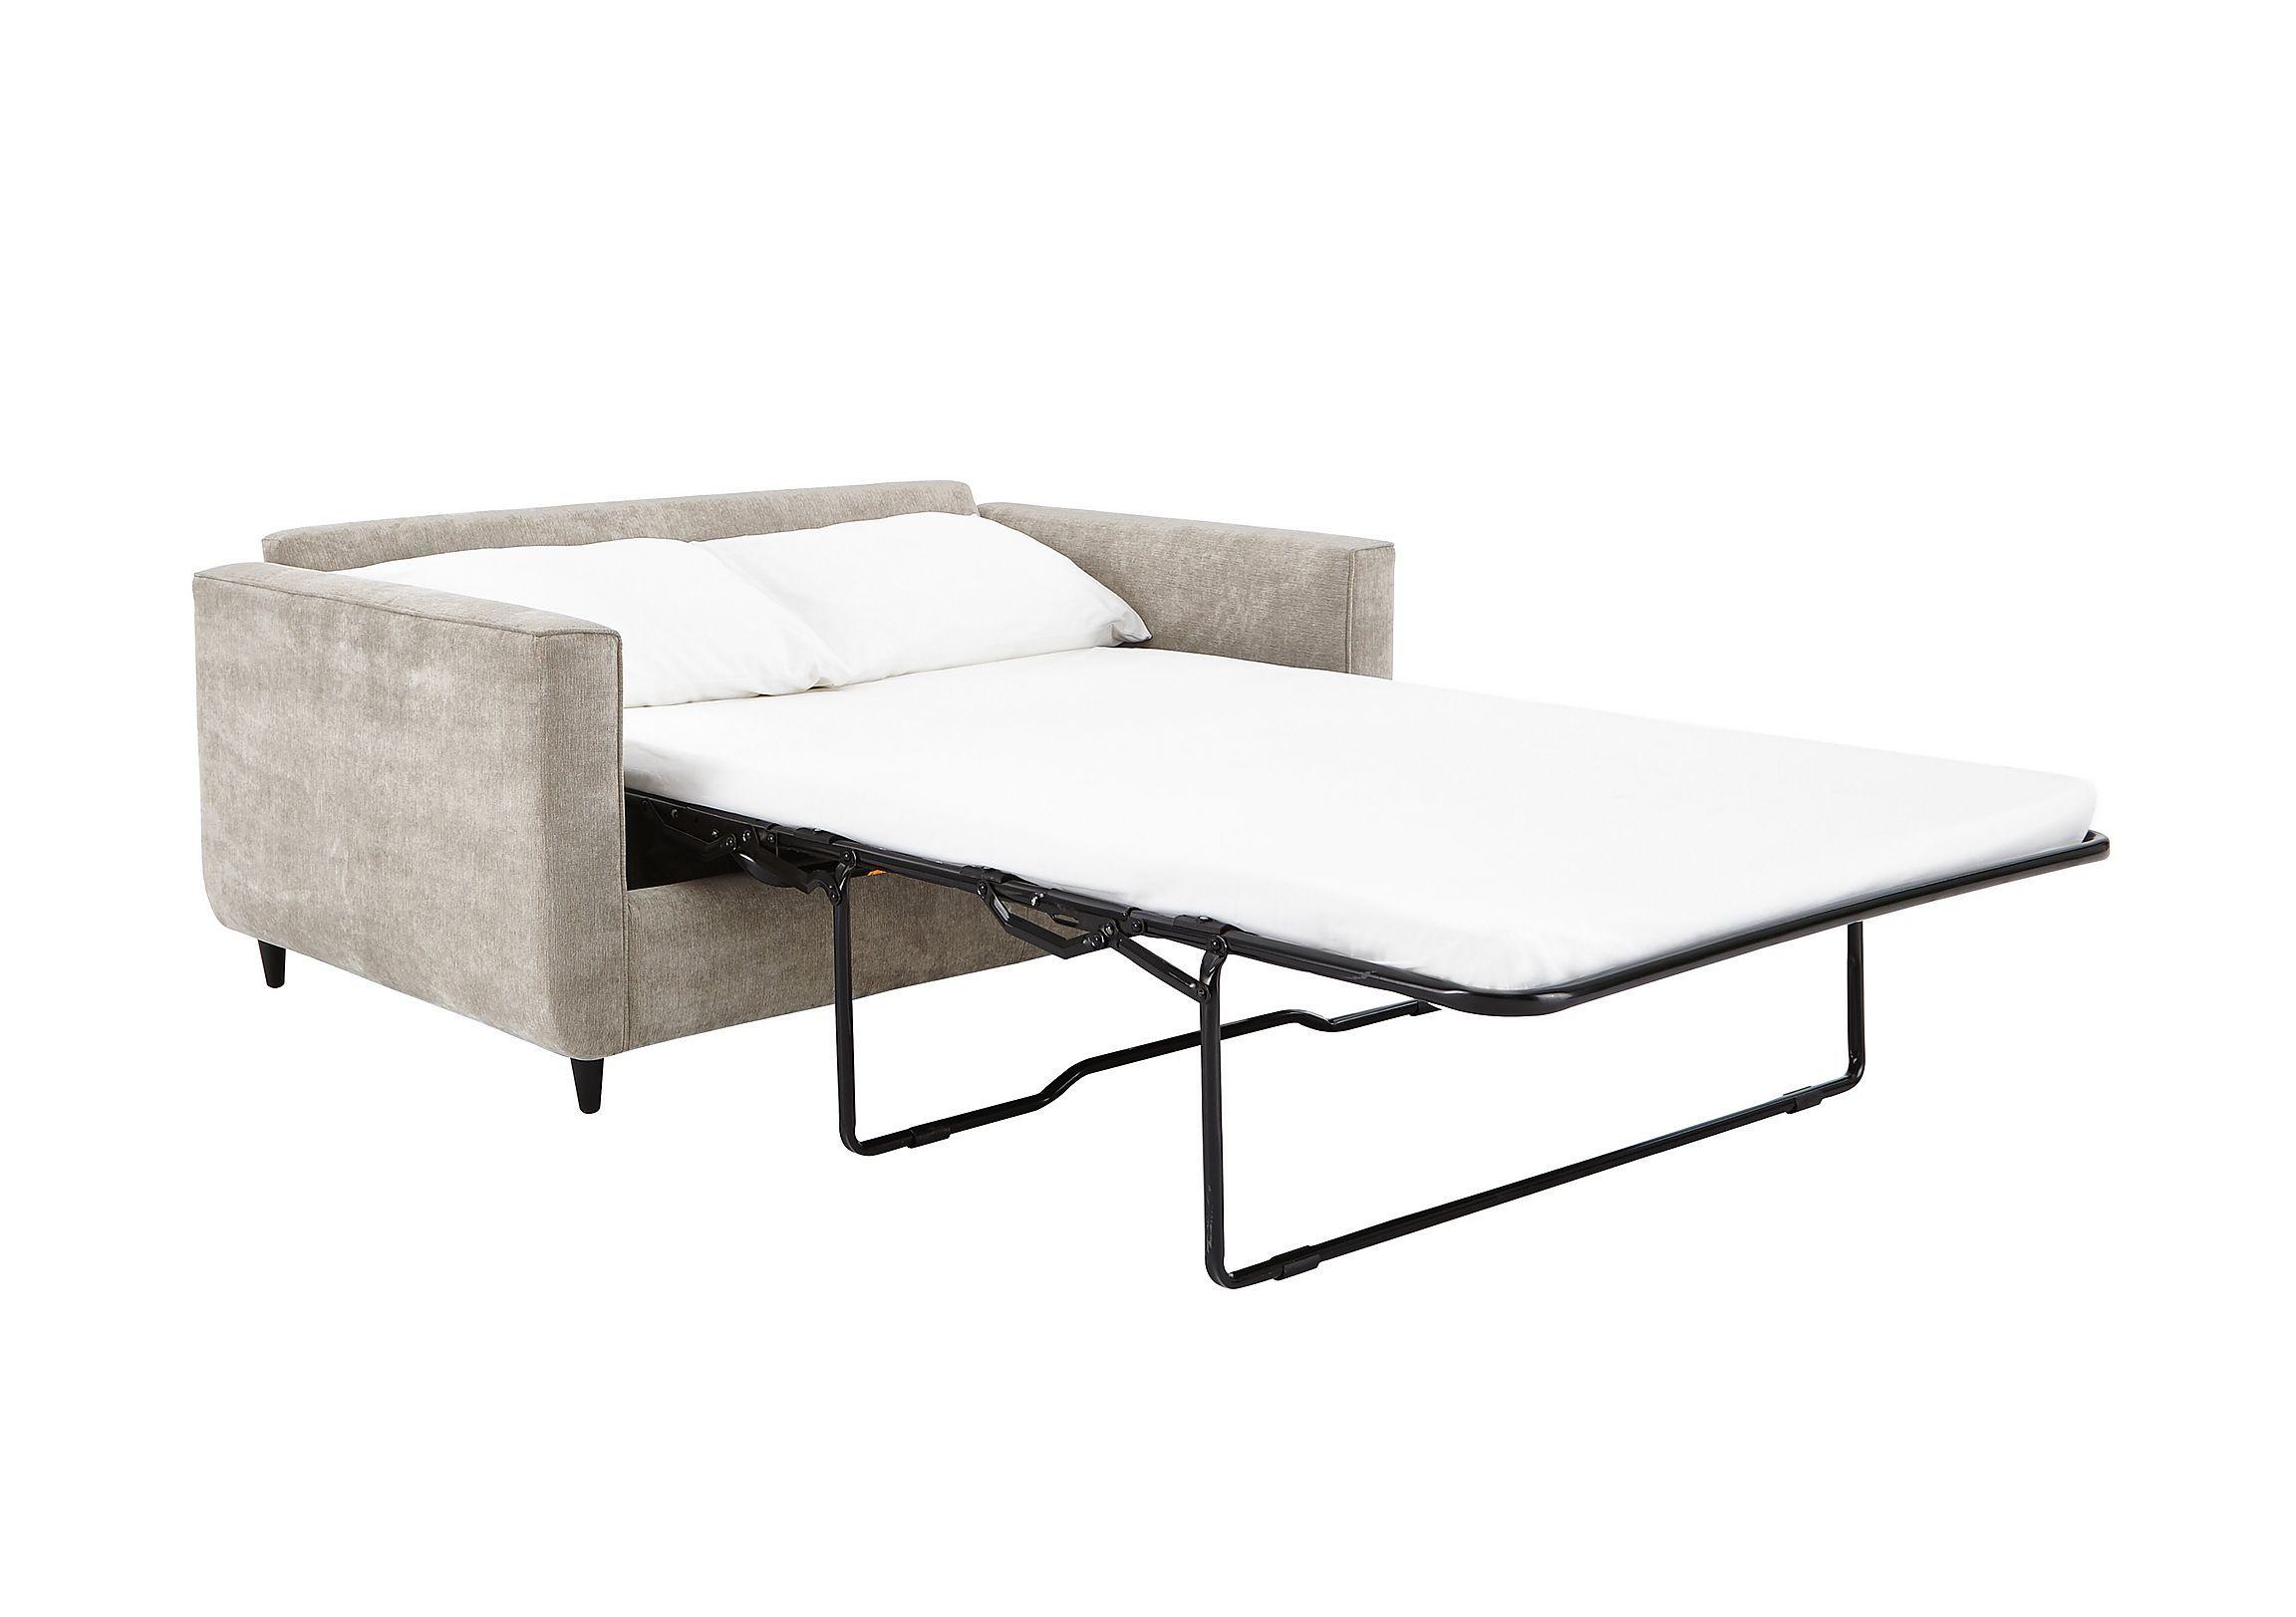 Astounding Esprit 2 Seater Fabric Sofa Bed Sale 699 Furniture Machost Co Dining Chair Design Ideas Machostcouk